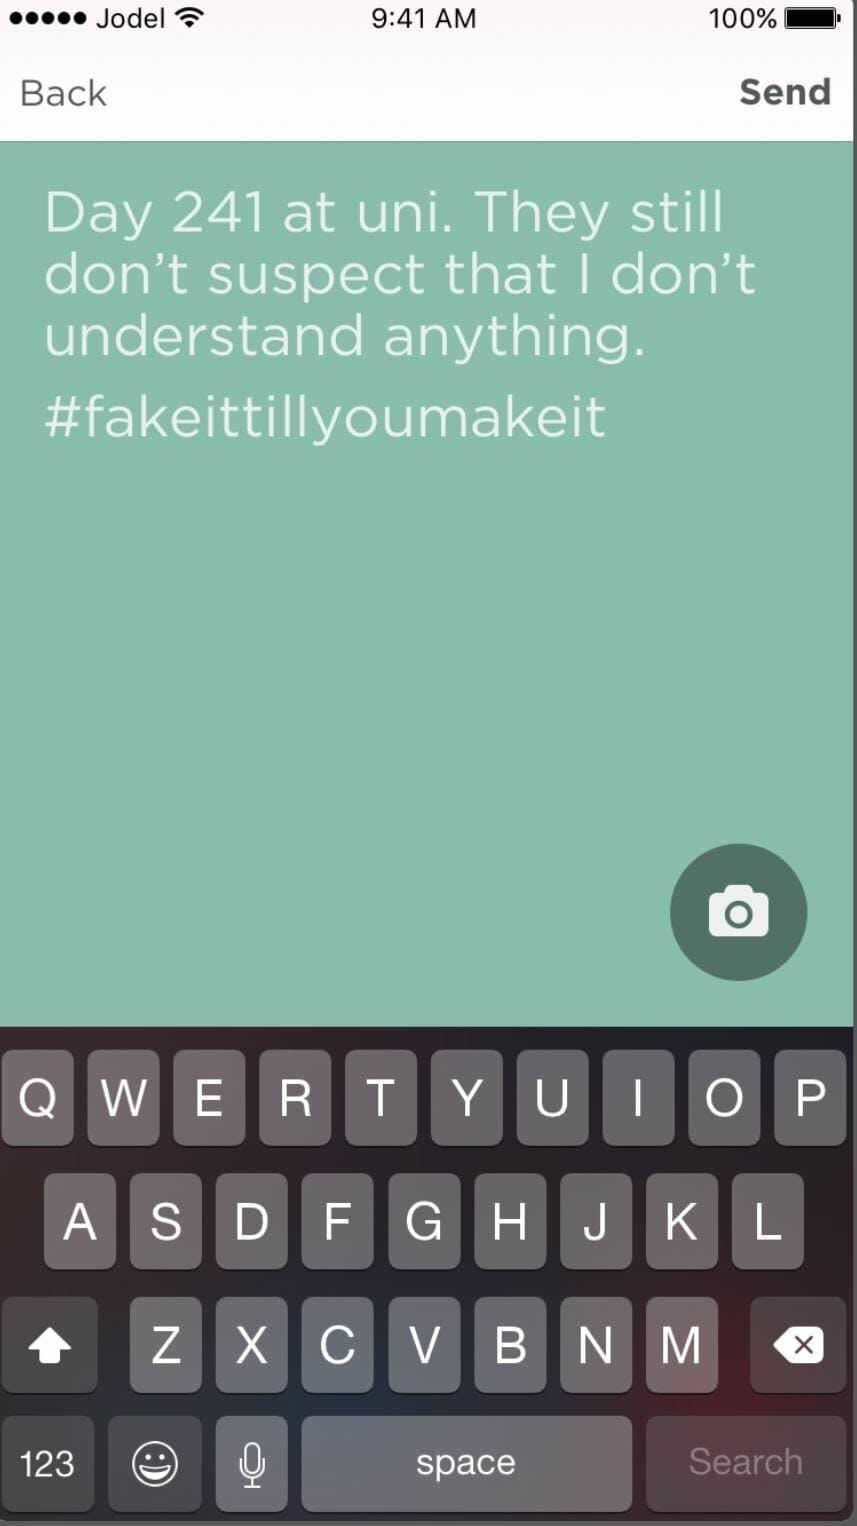 jodel anonymous messaging app